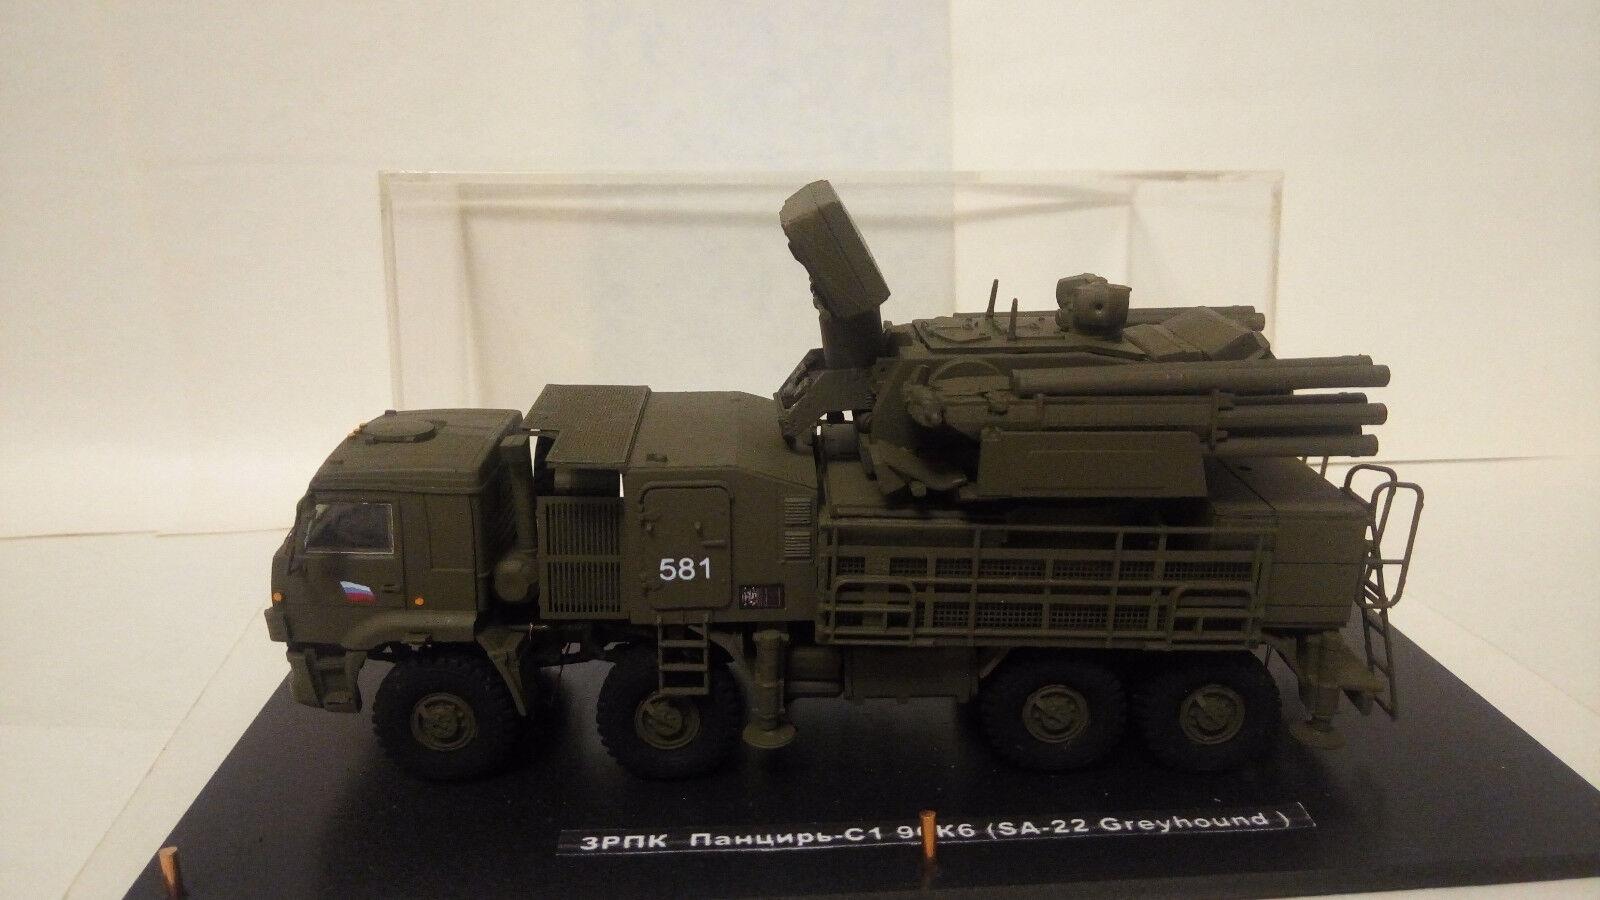 PANTSIR-C1 96K6 (SA-22 grauhound ) système mobile de défense antiaérien(1 72)